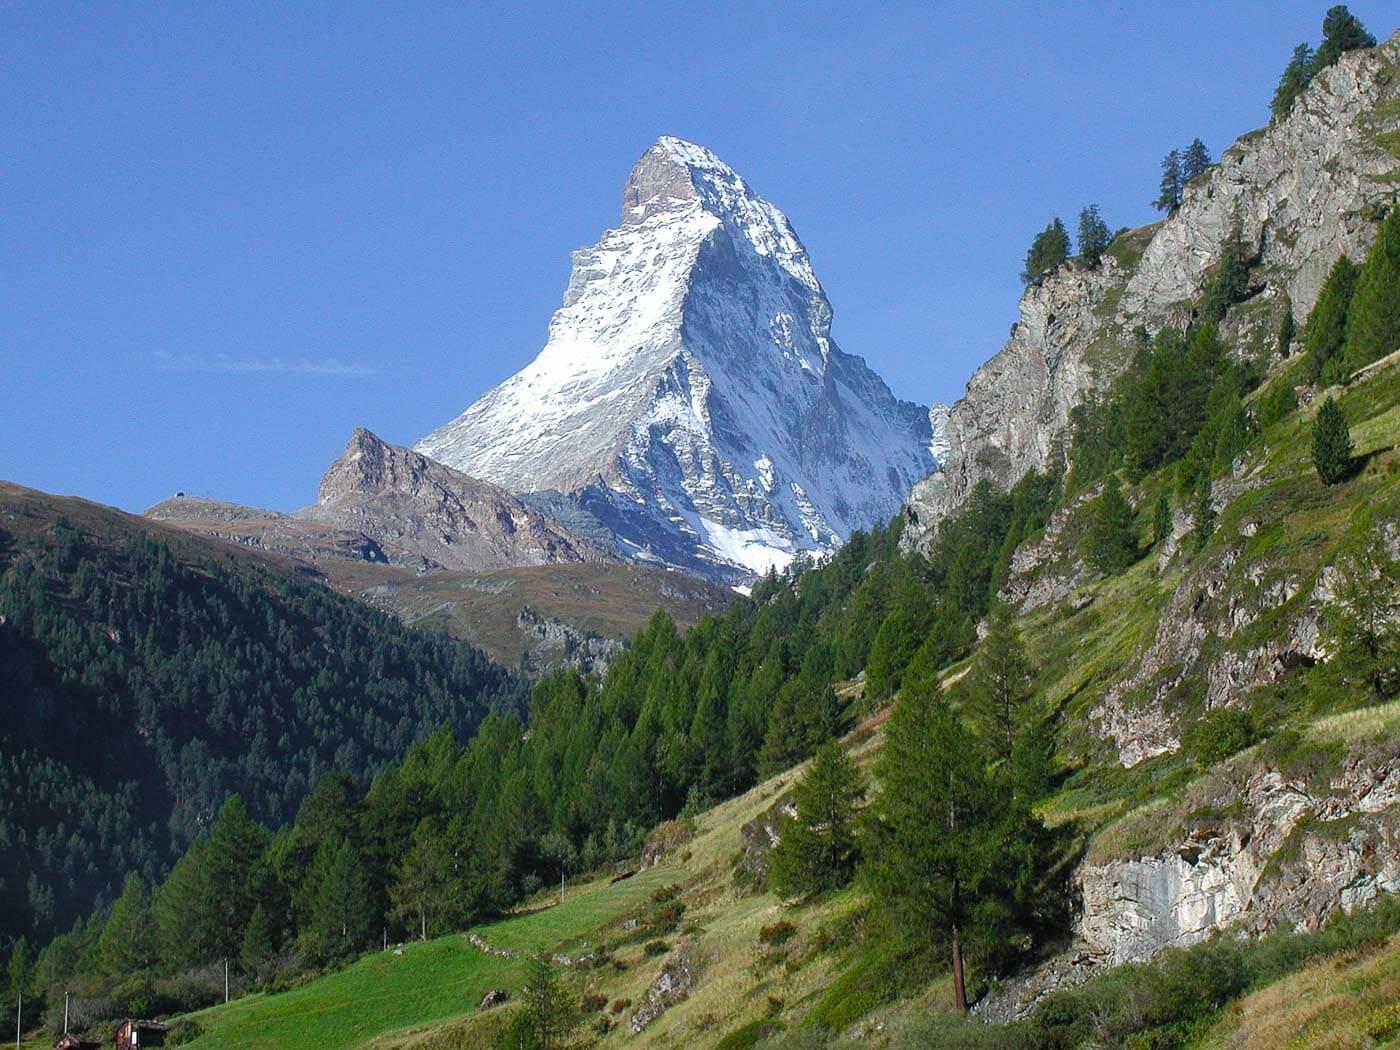 Viagem para Suíça - Turismo para Suíça - Monte Zermatt